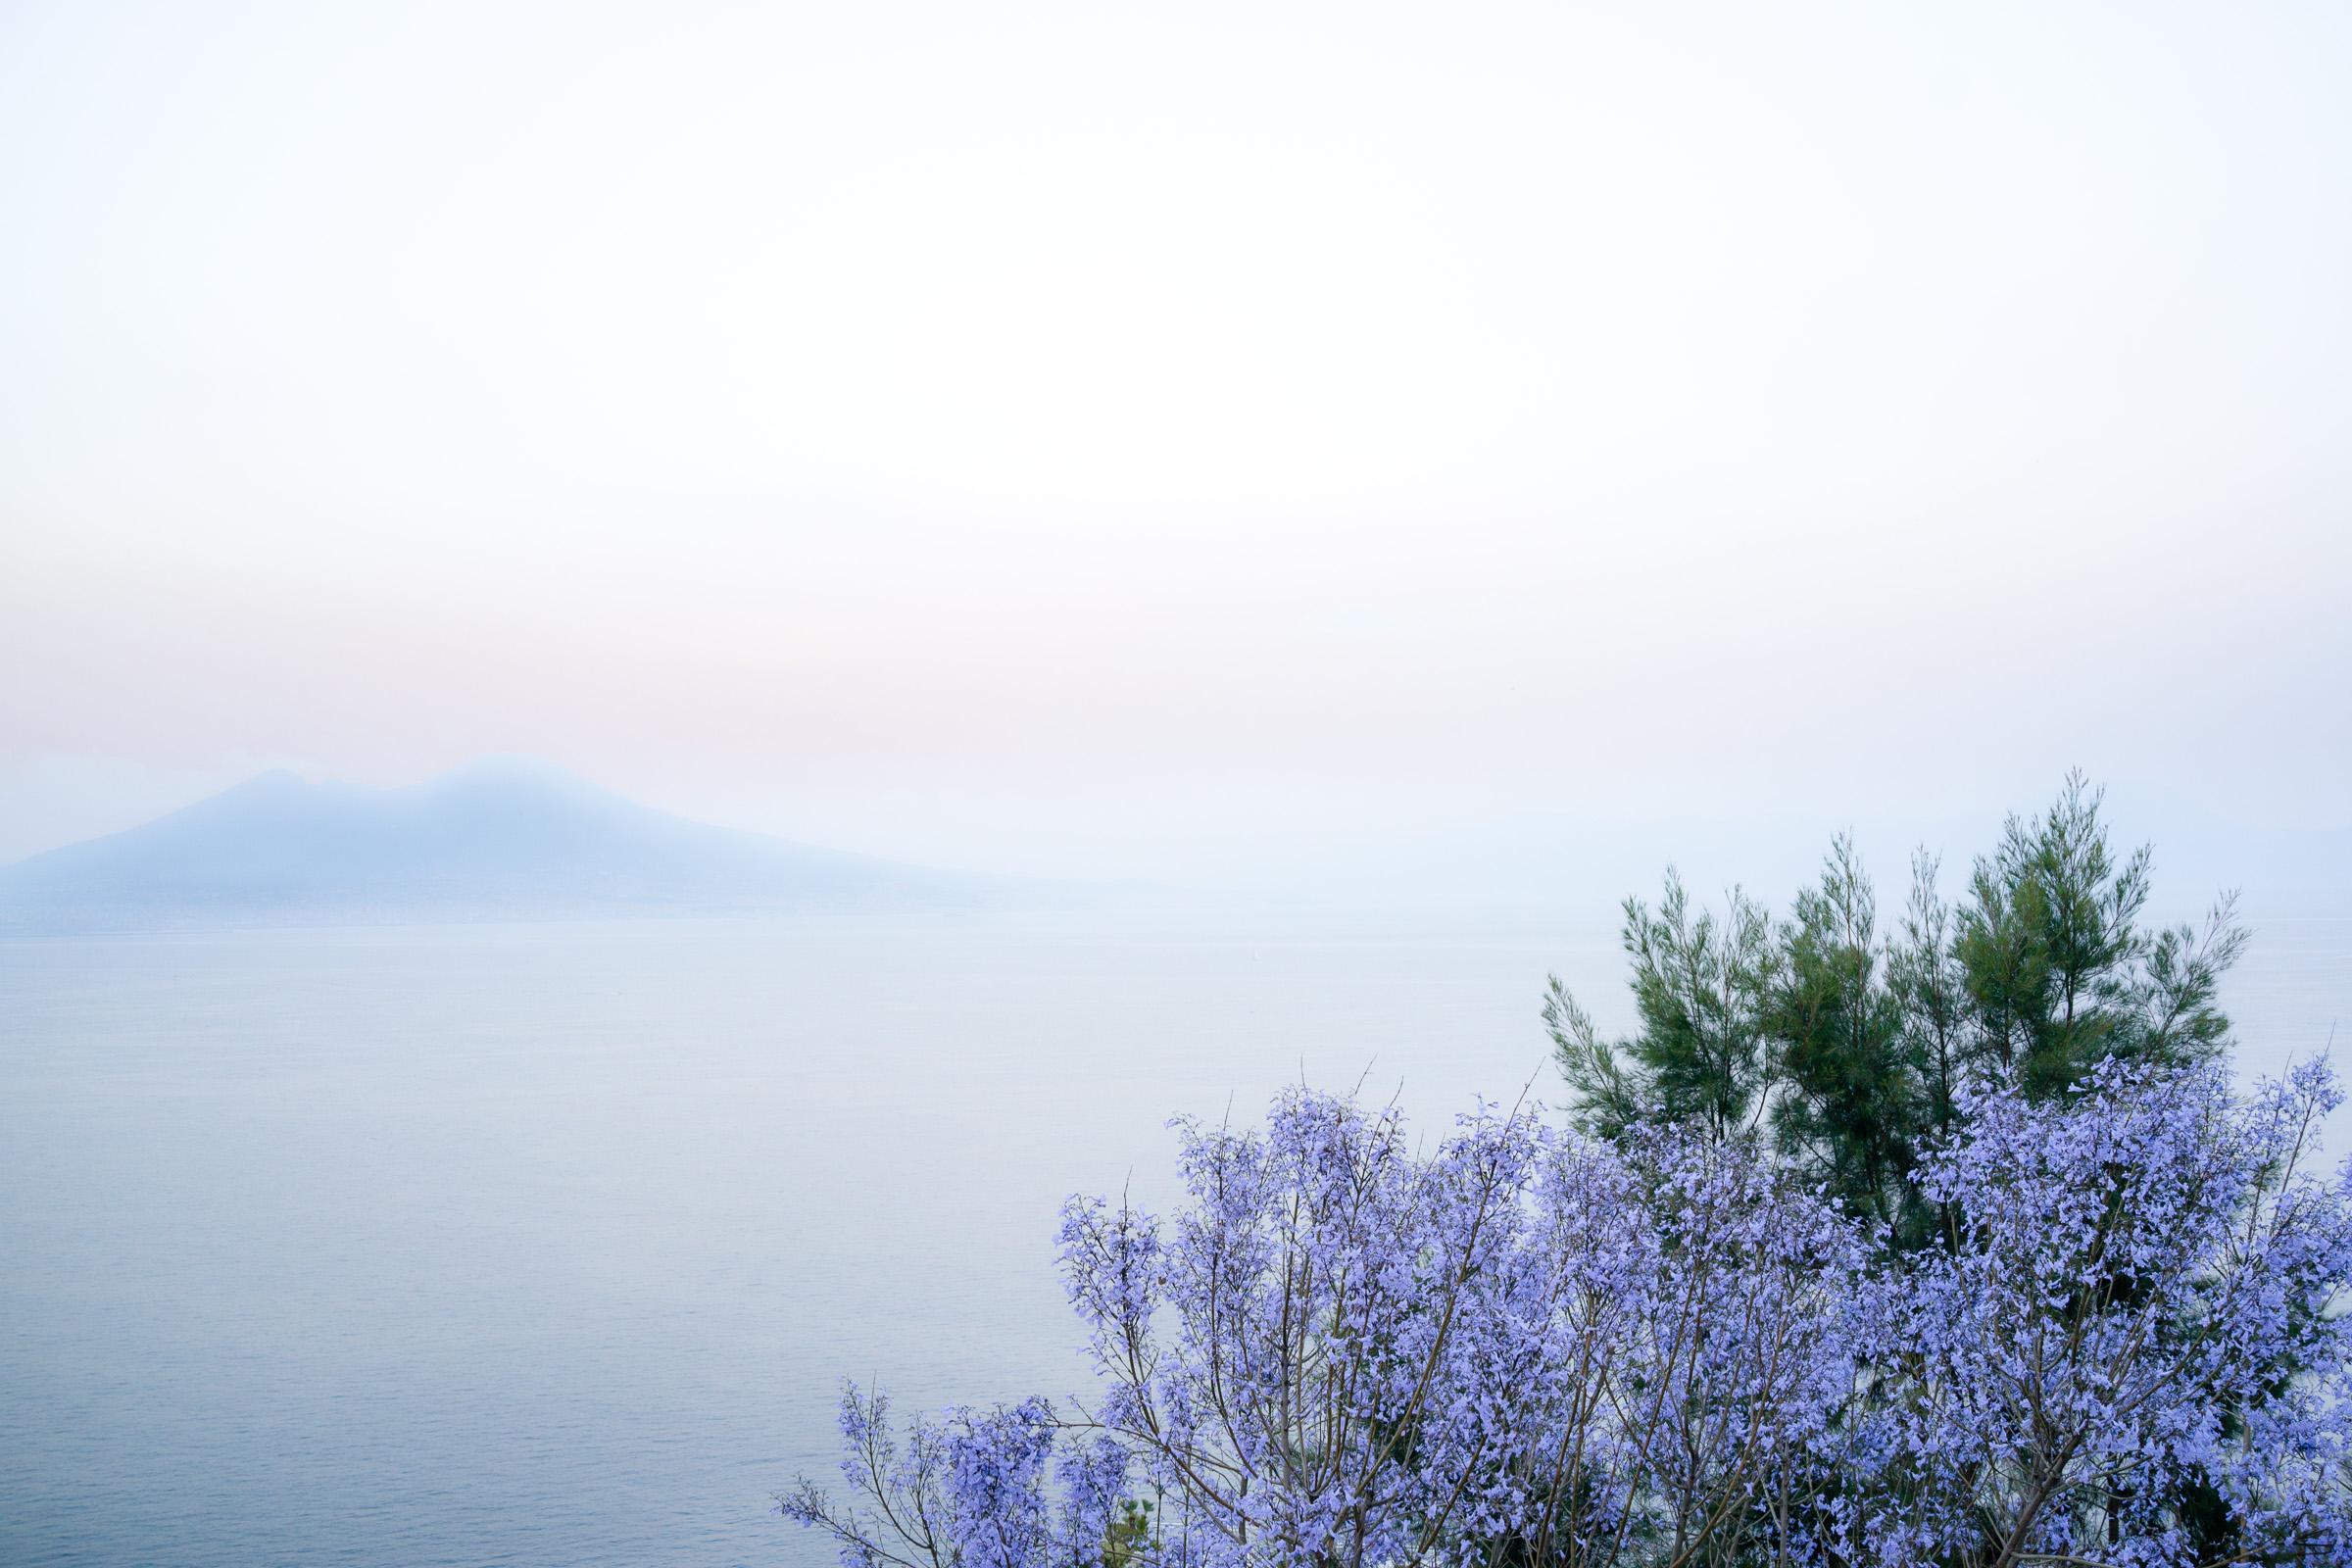 Naples & Vesuvius, timecode 20:35 ➛ 21:10